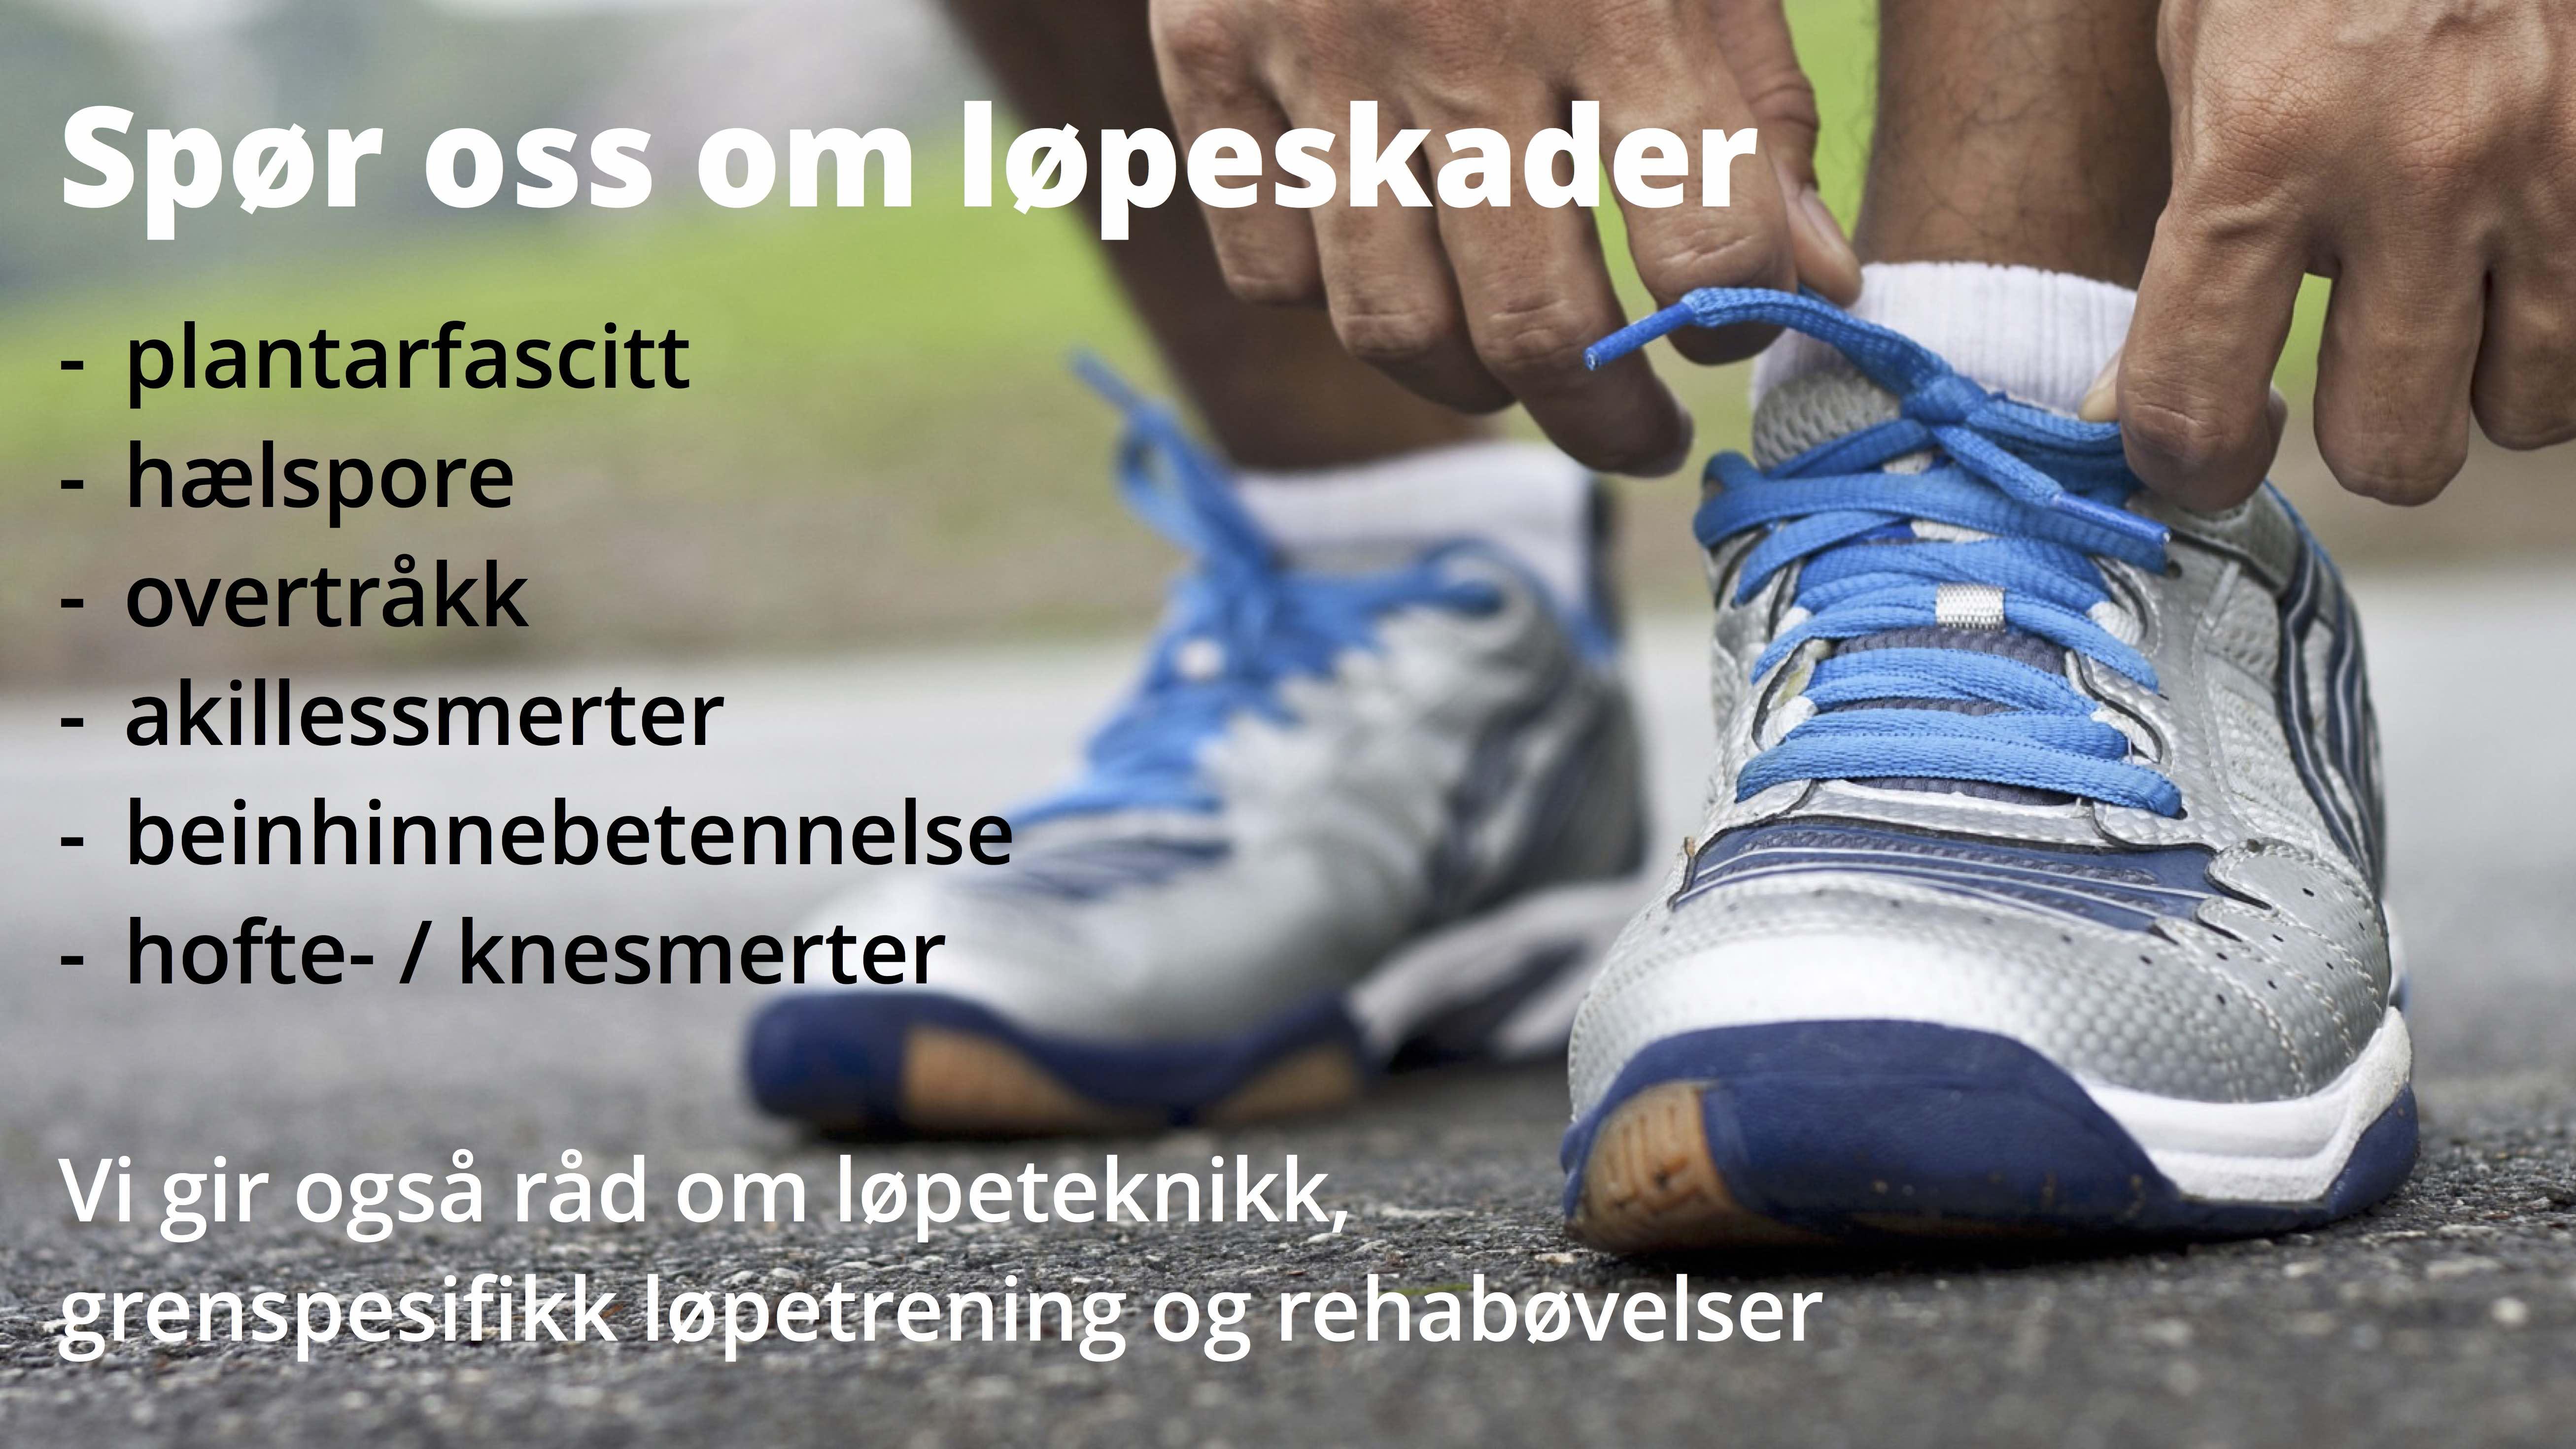 Idrettsskader løpeskader